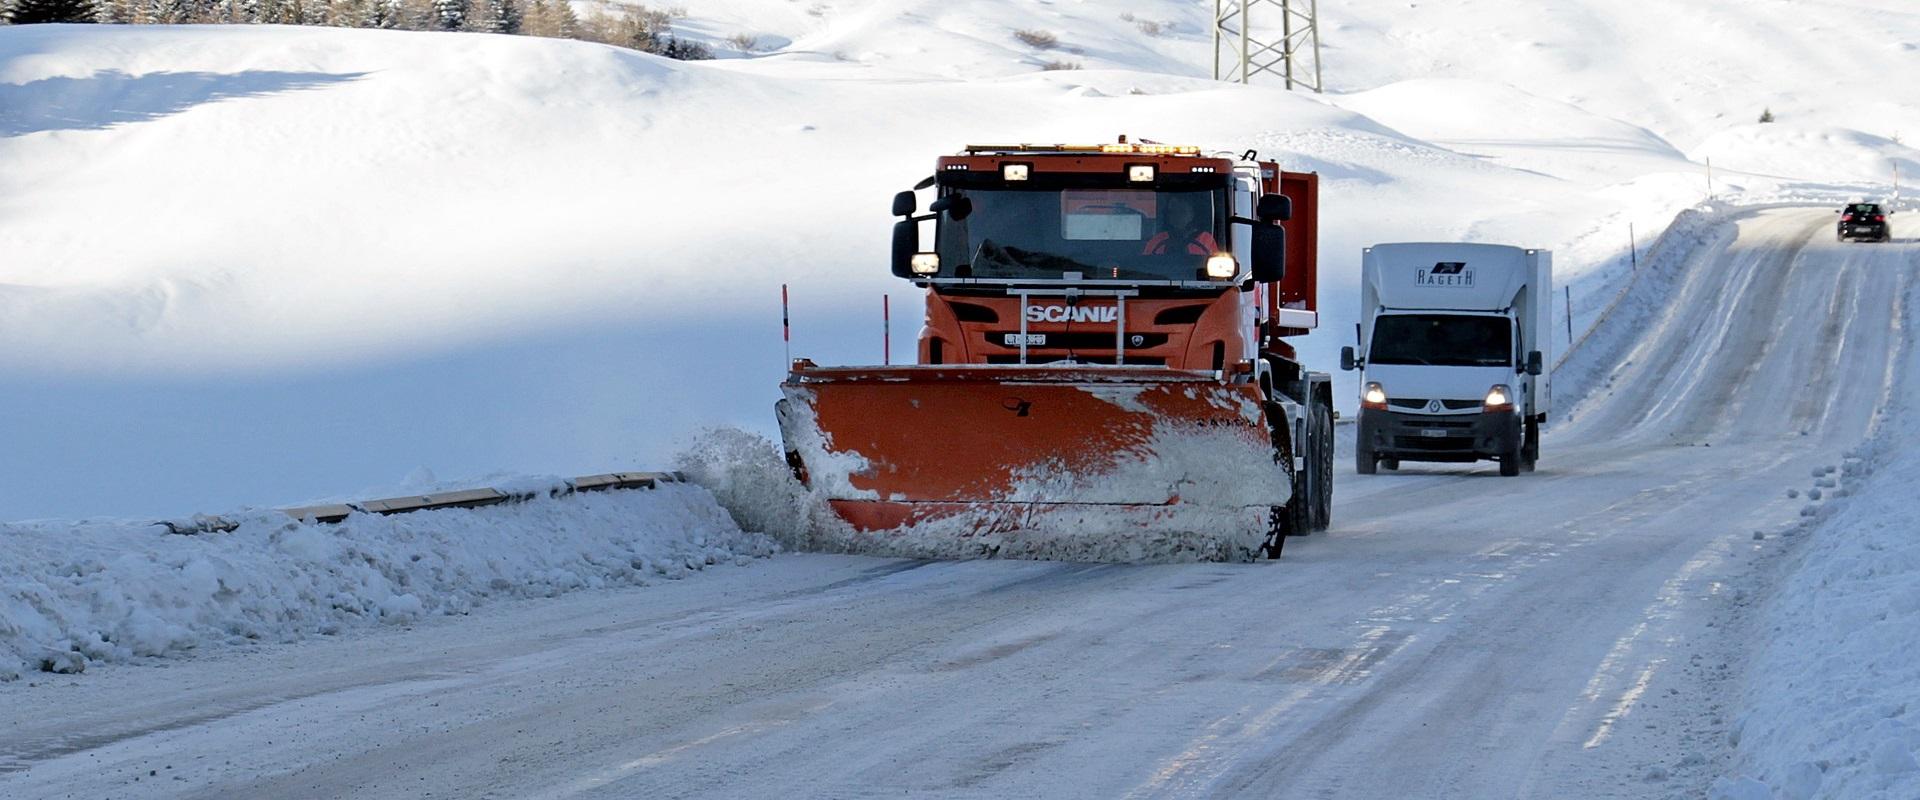 snow-3065363_1920